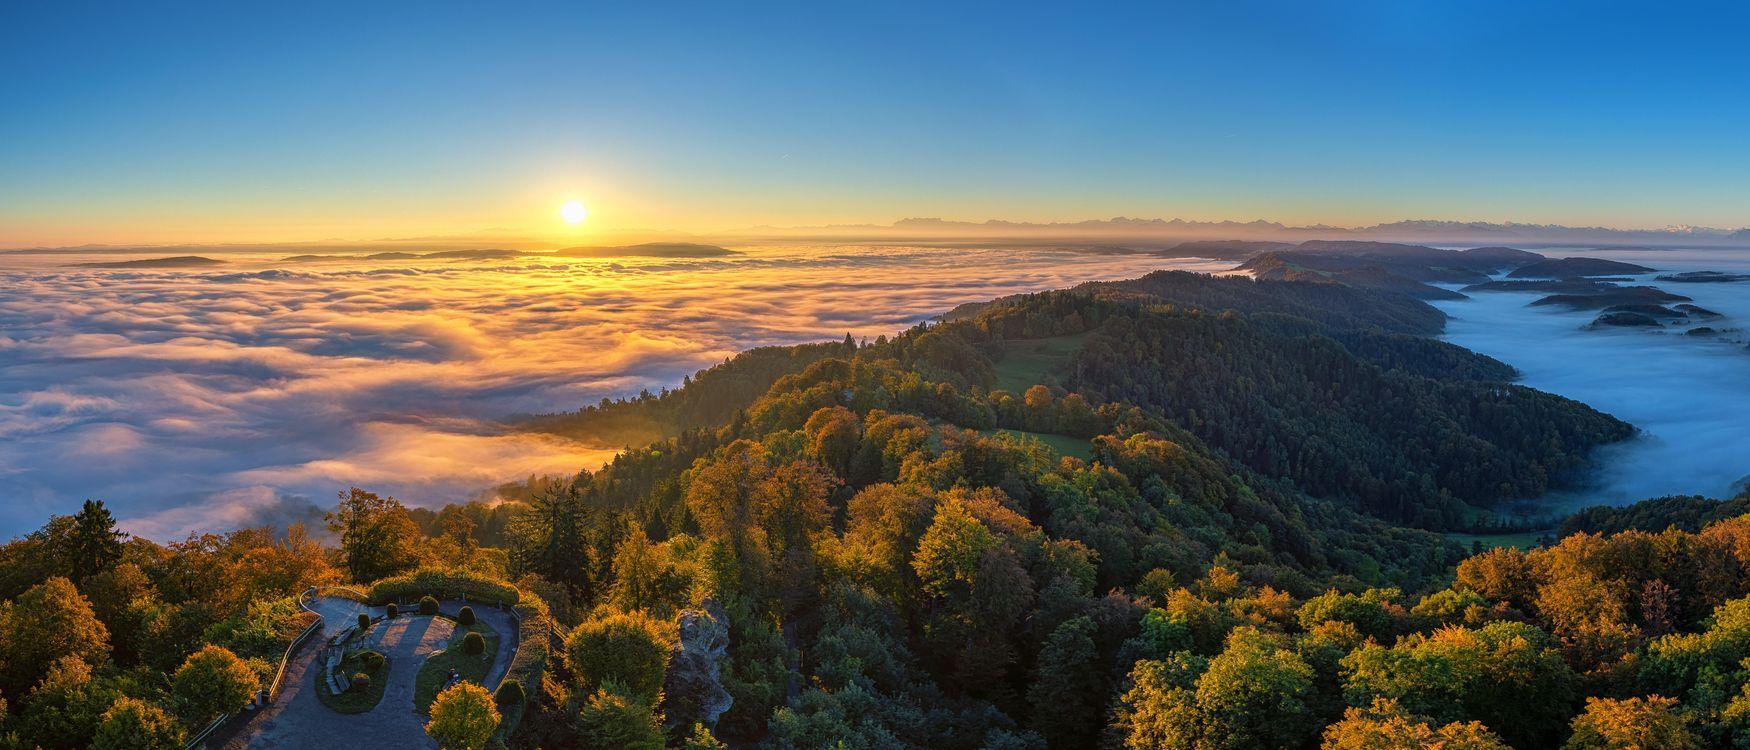 Фото бесплатно Цюрих, Море тумана, Восход - на рабочий стол